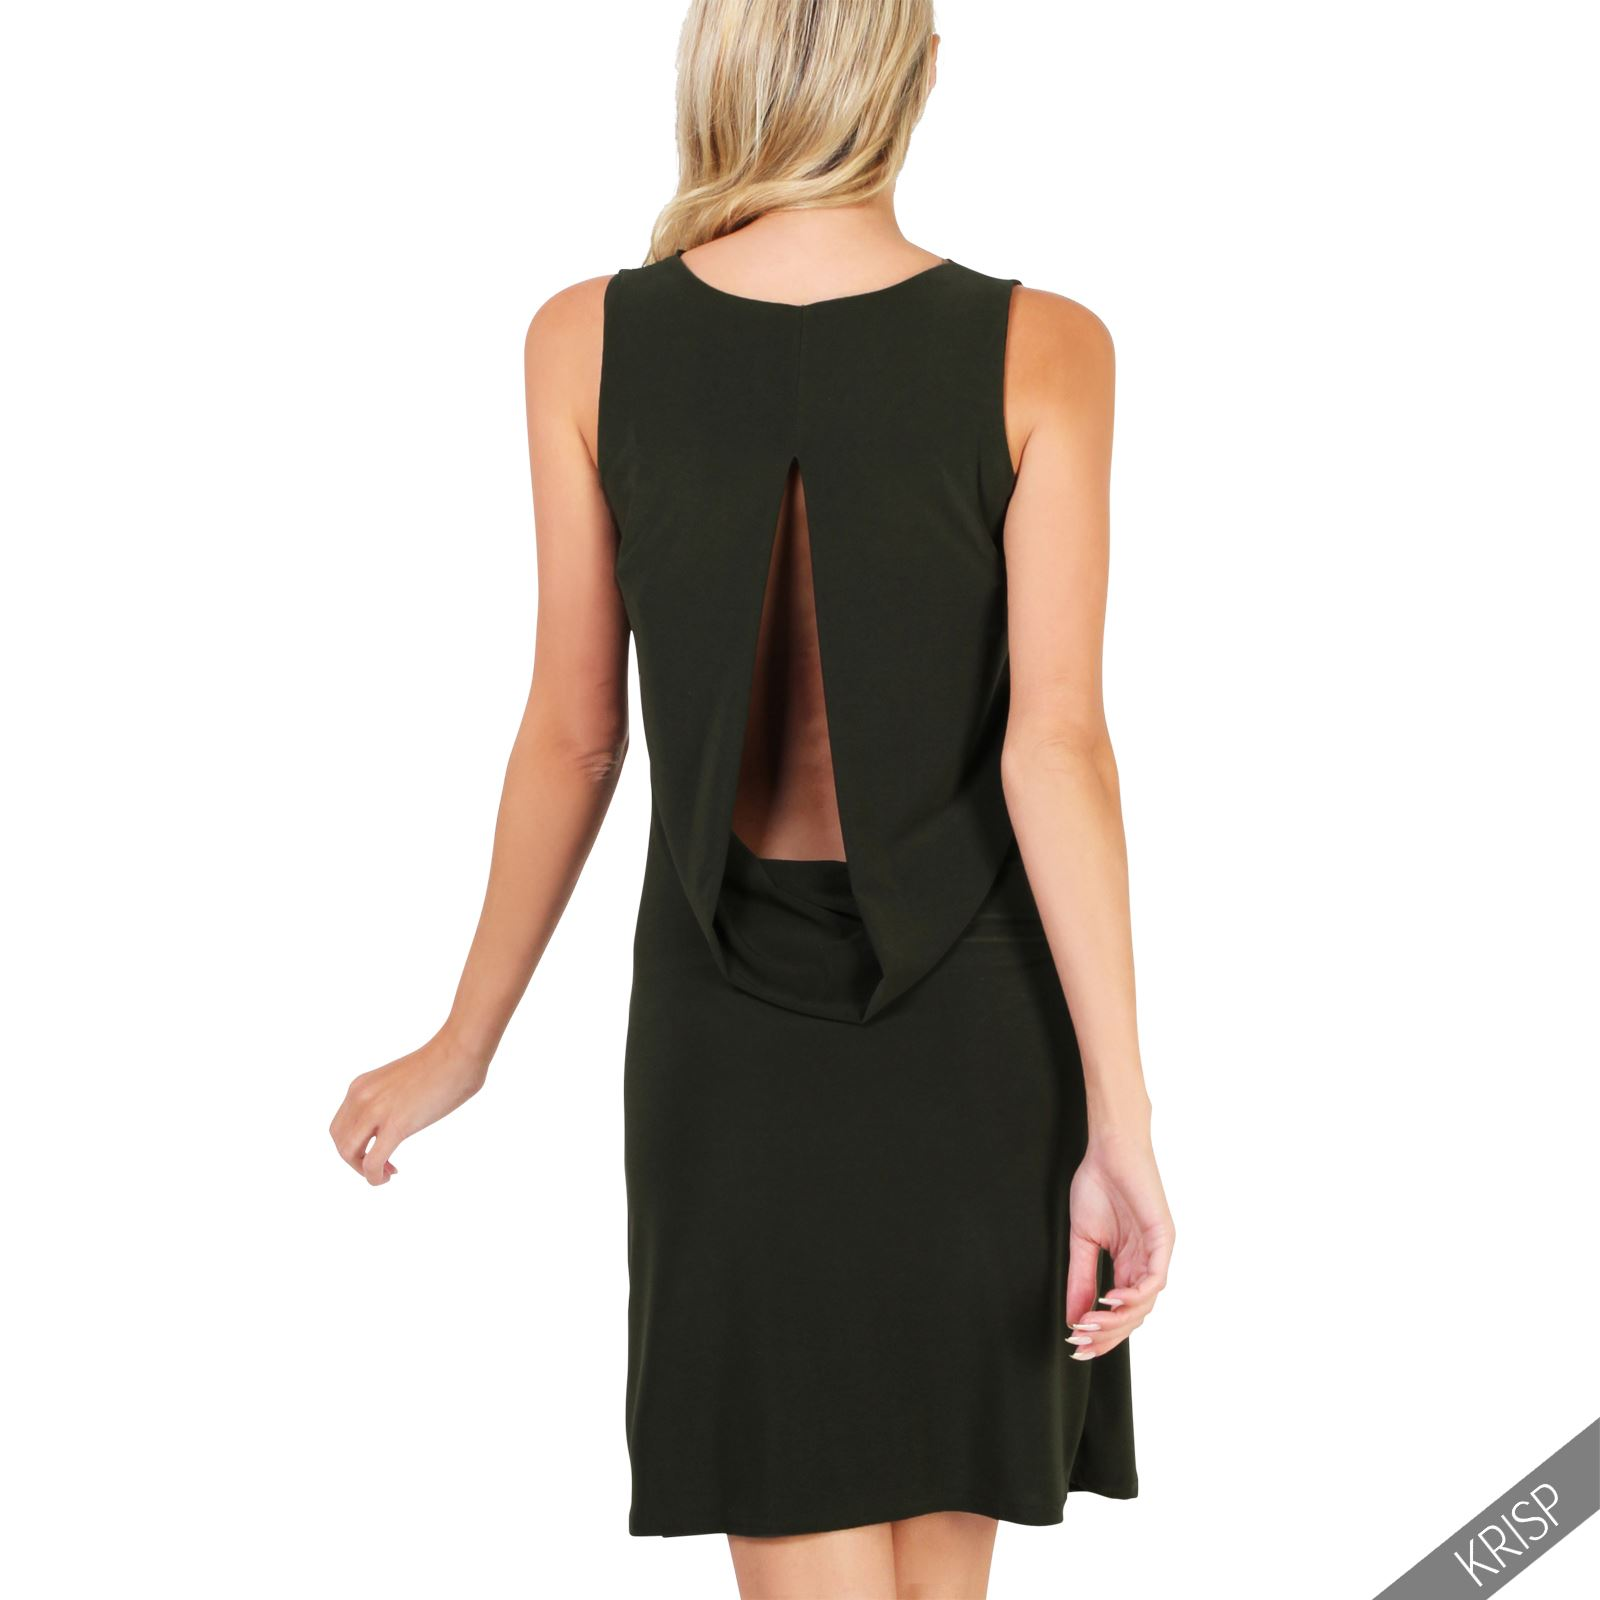 femmes robe col b nitier plongeant dos nu moulante sans manche uni mini sexy ebay. Black Bedroom Furniture Sets. Home Design Ideas